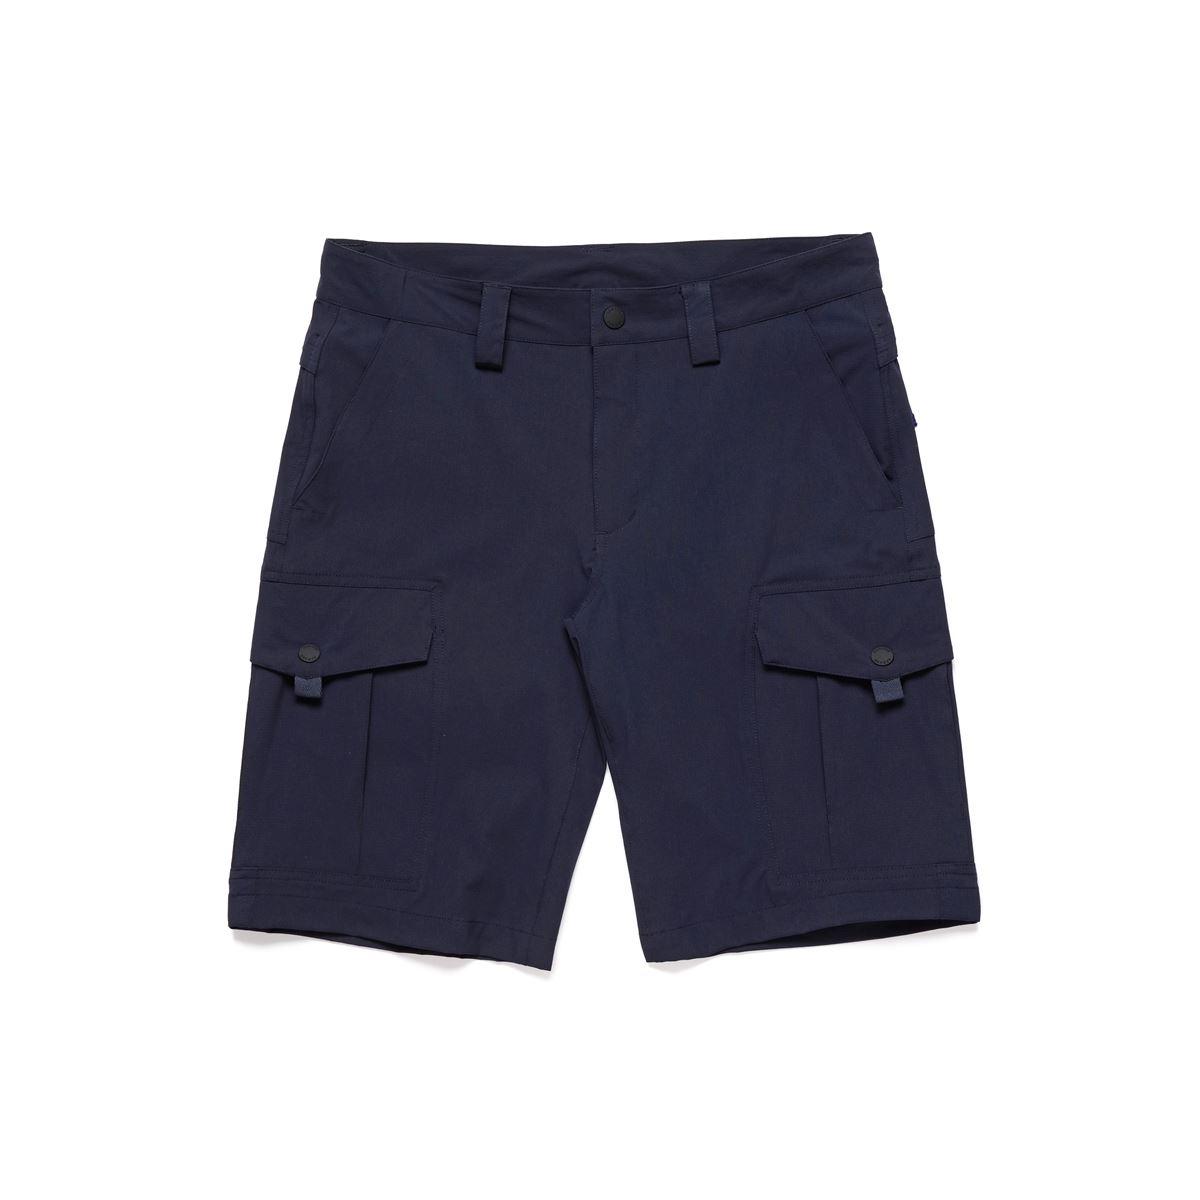 Sebago Pantaloncini uomo-7111KLW